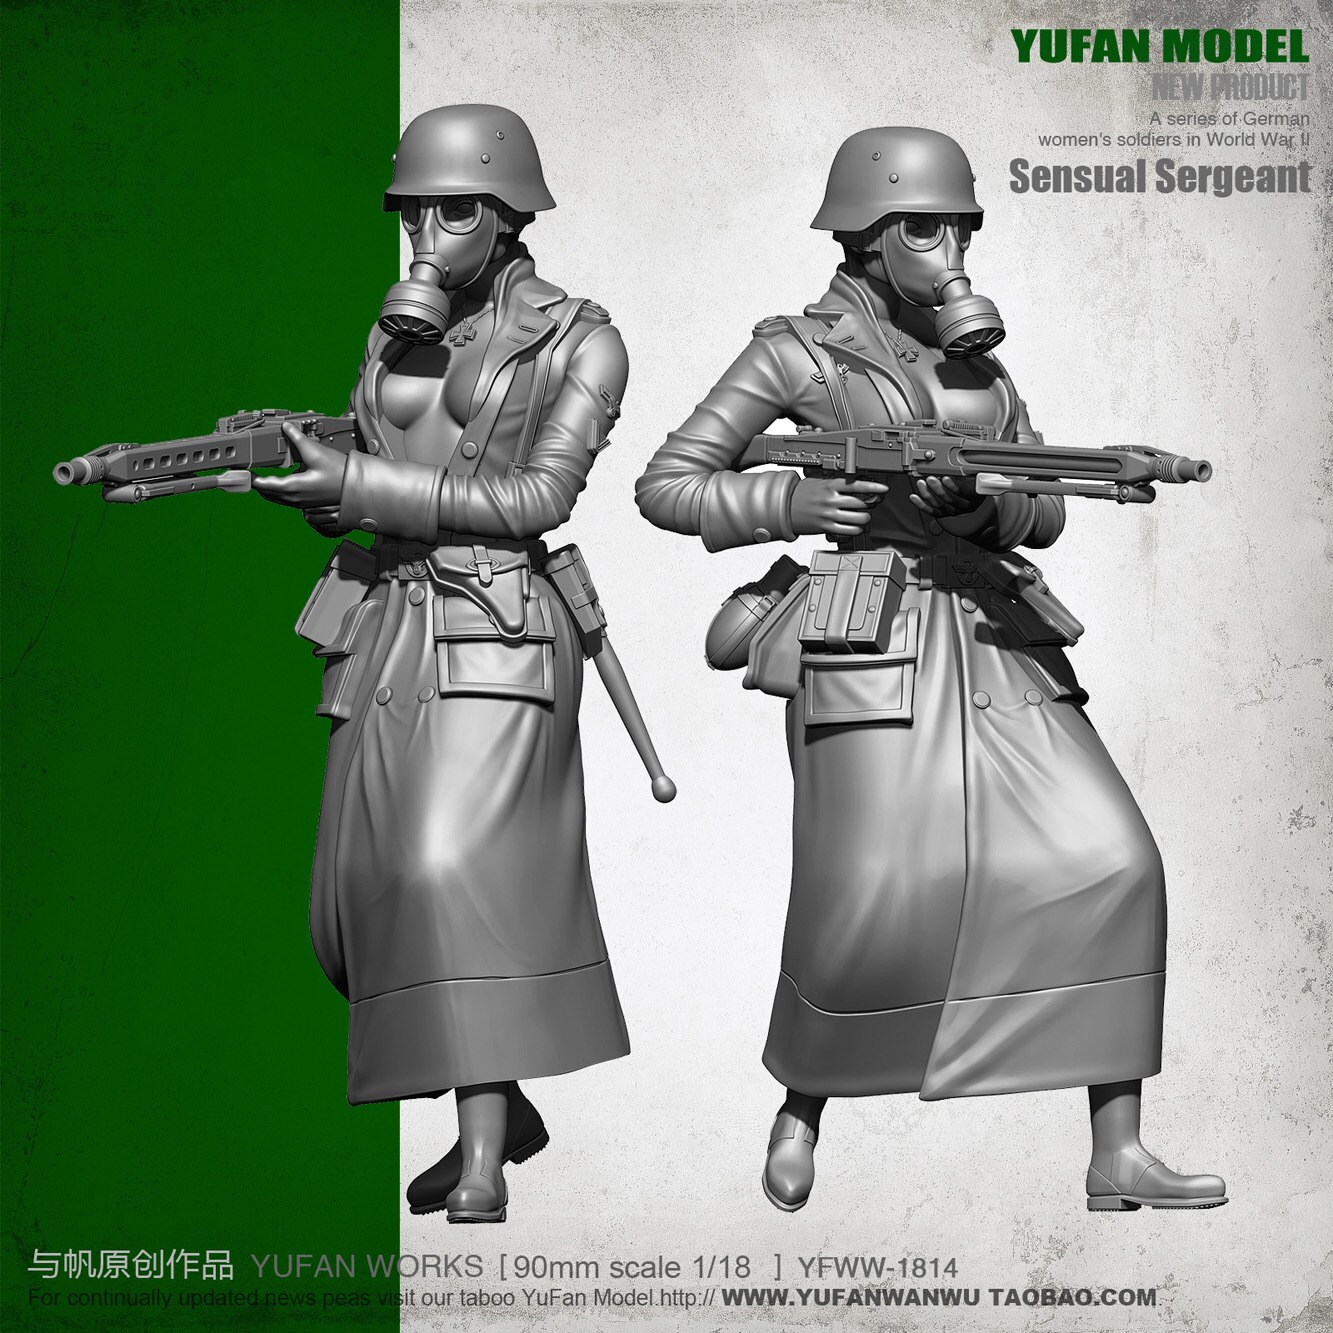 1/18 German Sexy Beauty Machine Gunner Resin Soldier YFWW-1814